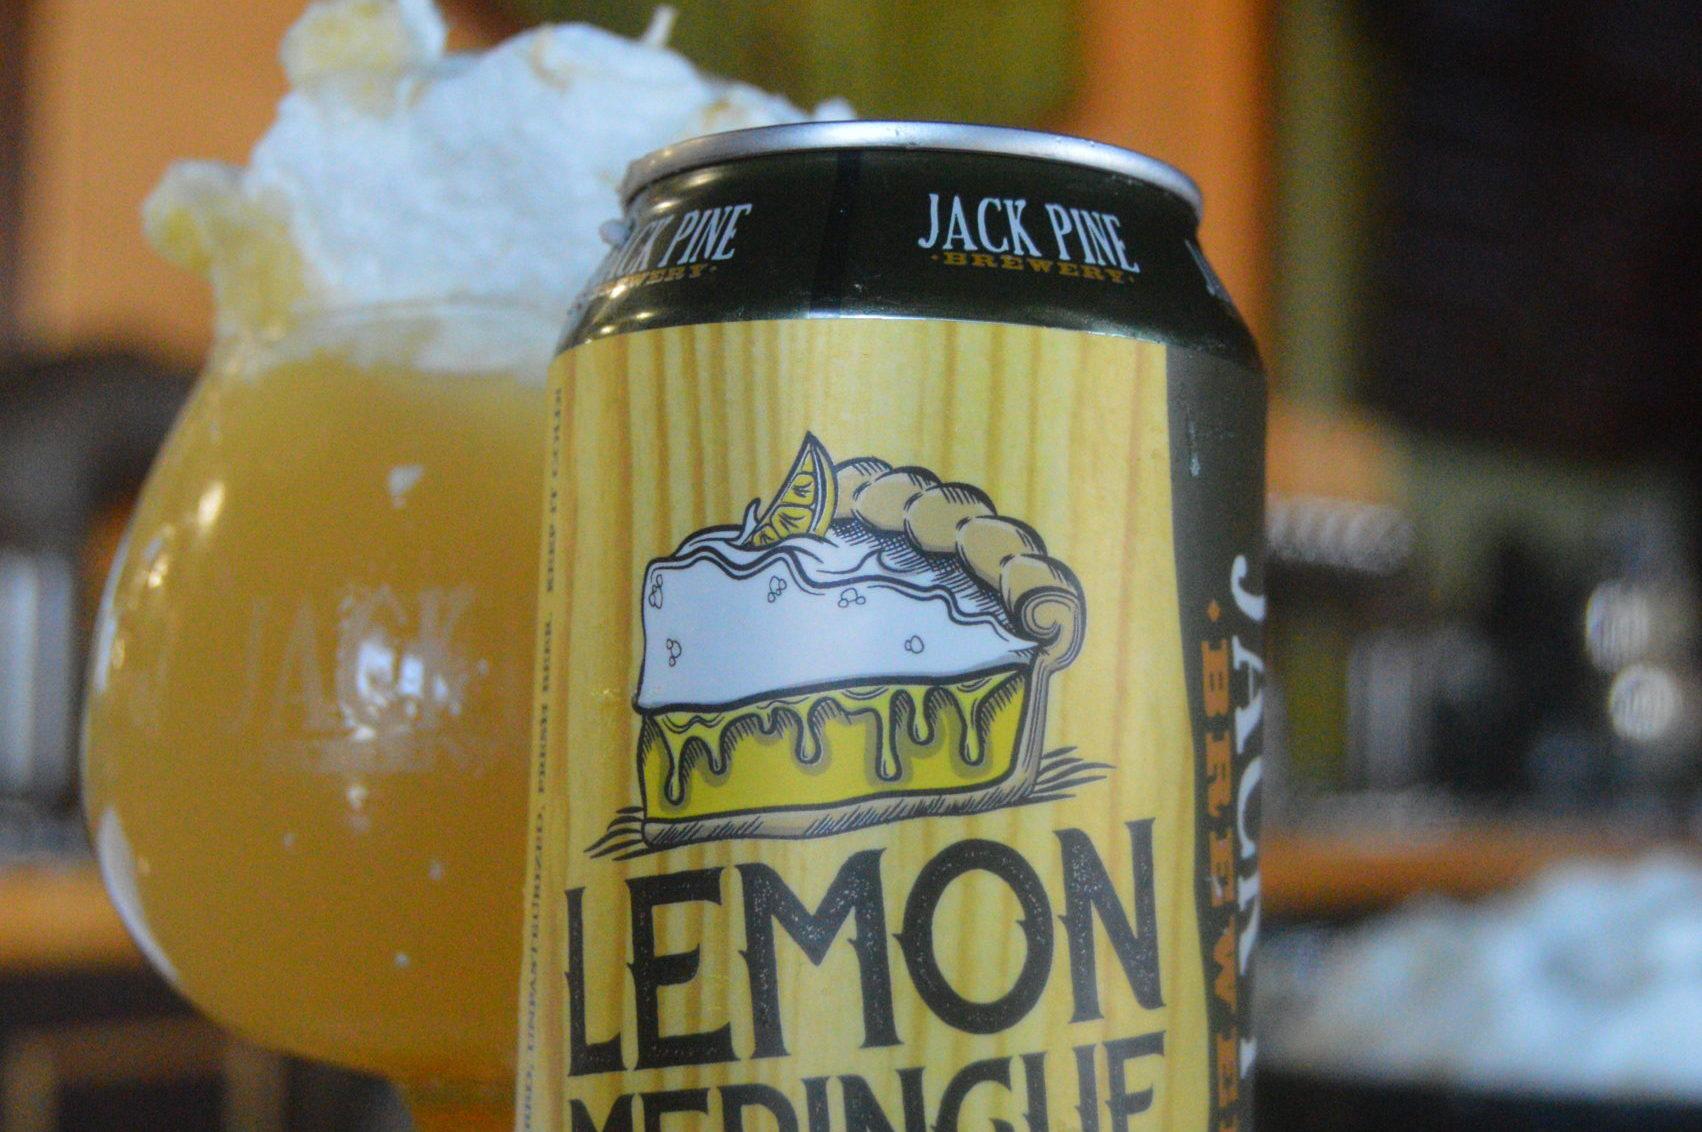 Jack Pine Lemon Meringue Pastry Sour • Photo via Jack Pine Brewery